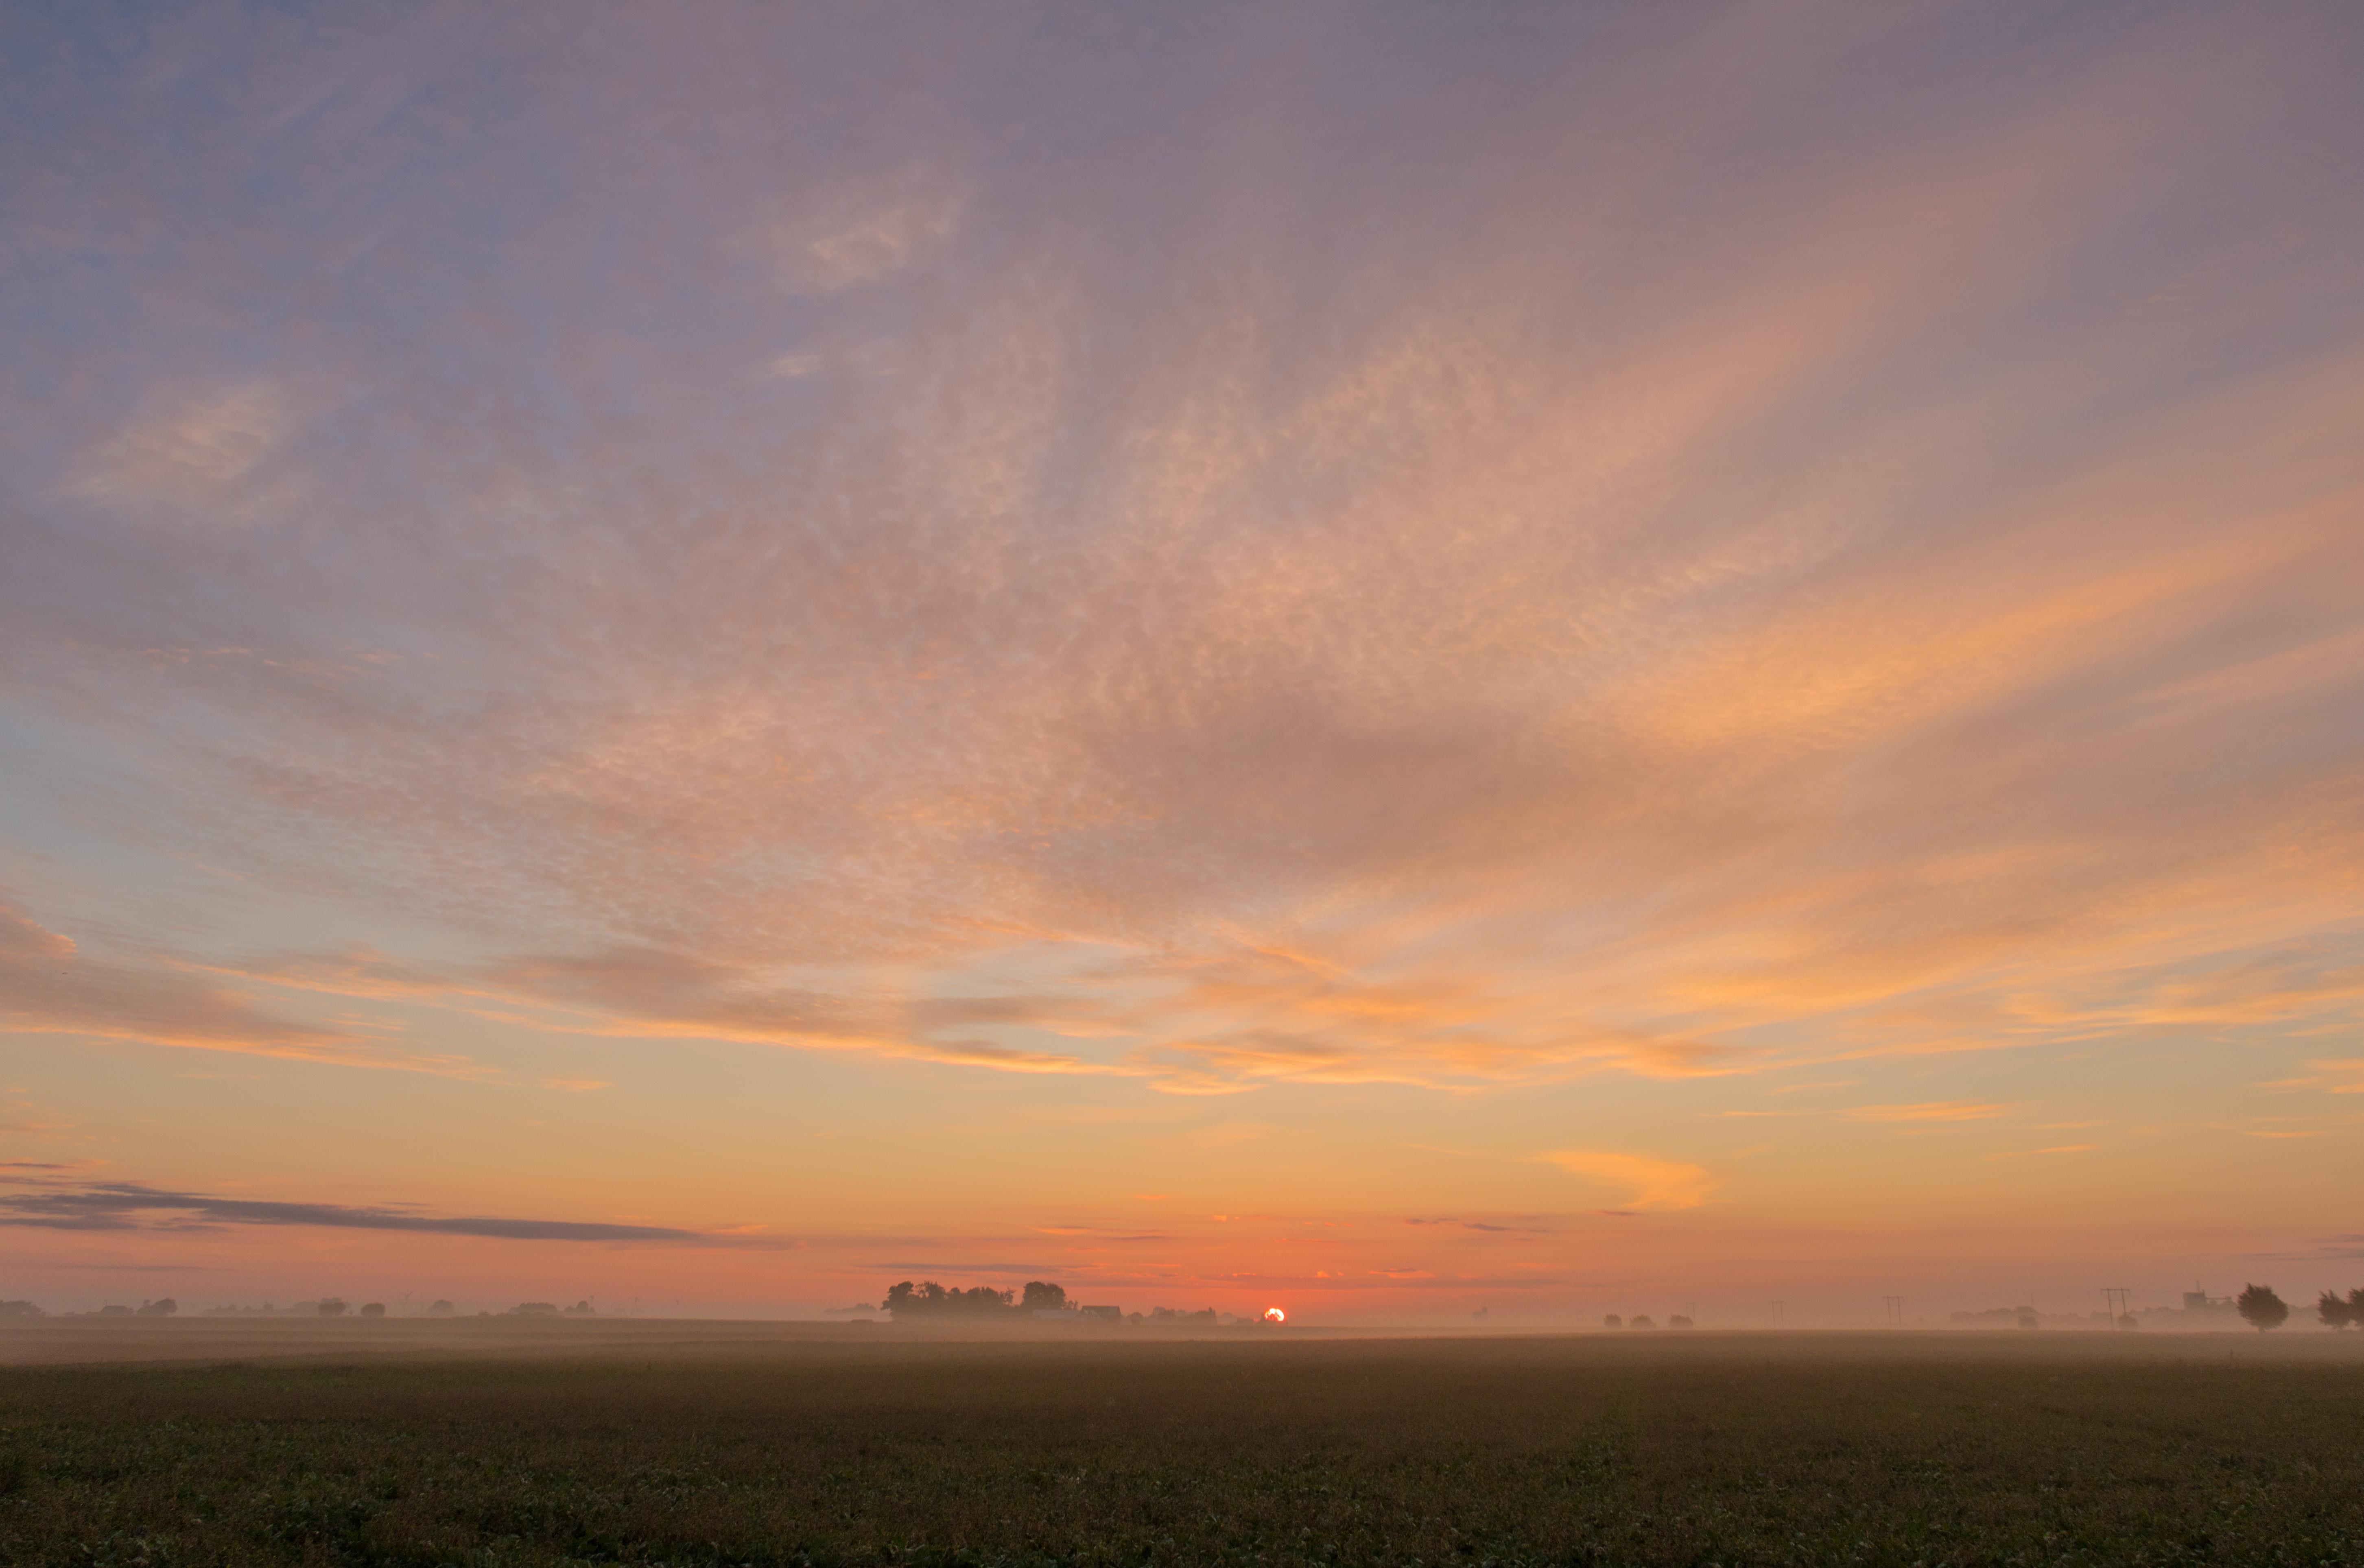 одно утро небо картинки многих